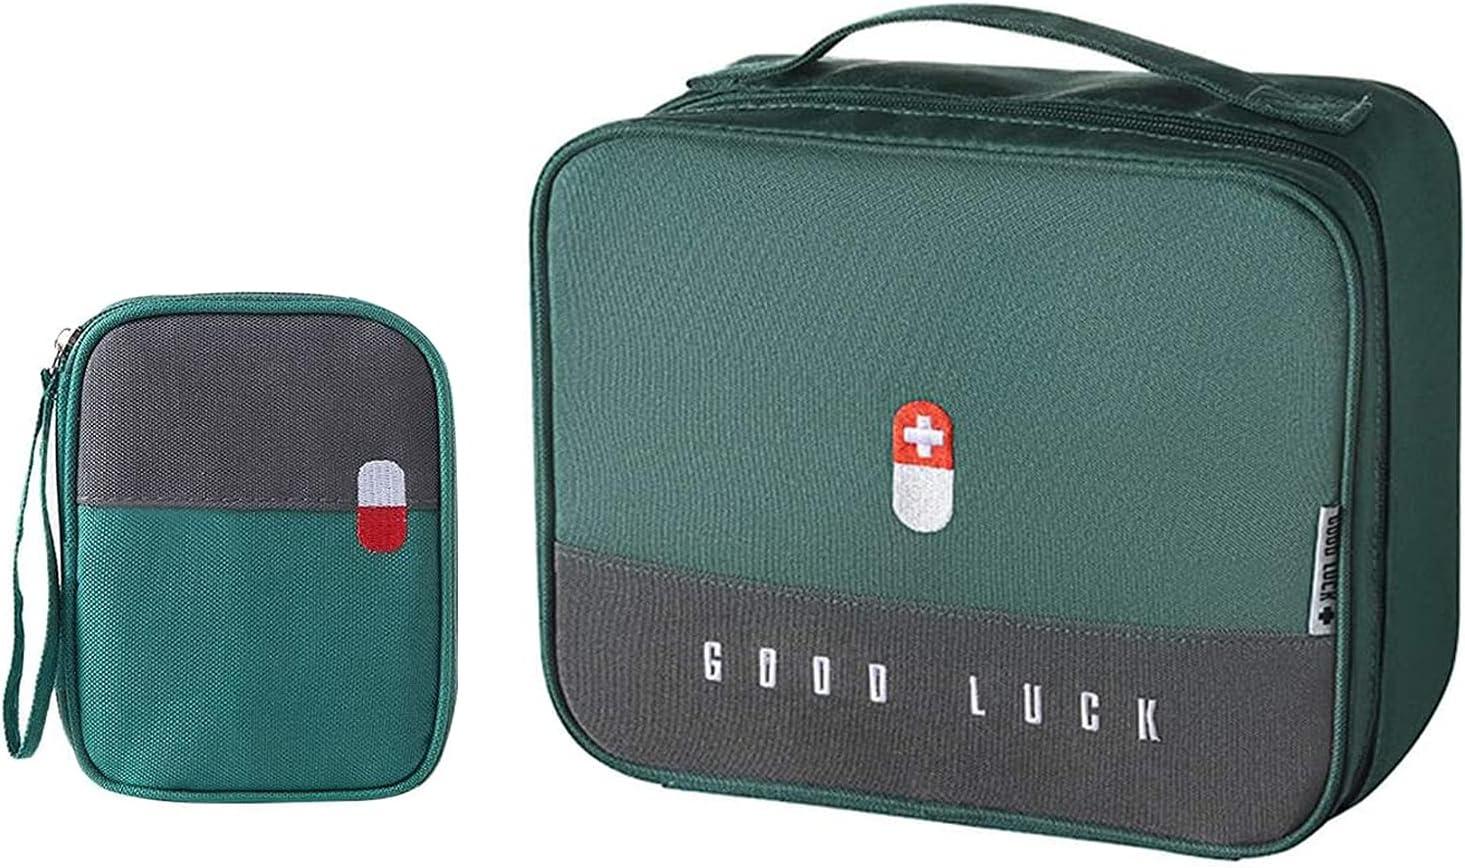 2 Piezas Caja Médica Portátil de Emergencia, Bolsa de Primeros Auxilios Compacta, Pequeña Bolsa de Medicina Para Emergencias, Para Emergencias, Hogar, Coche, Camping, Senderismo (Verde)